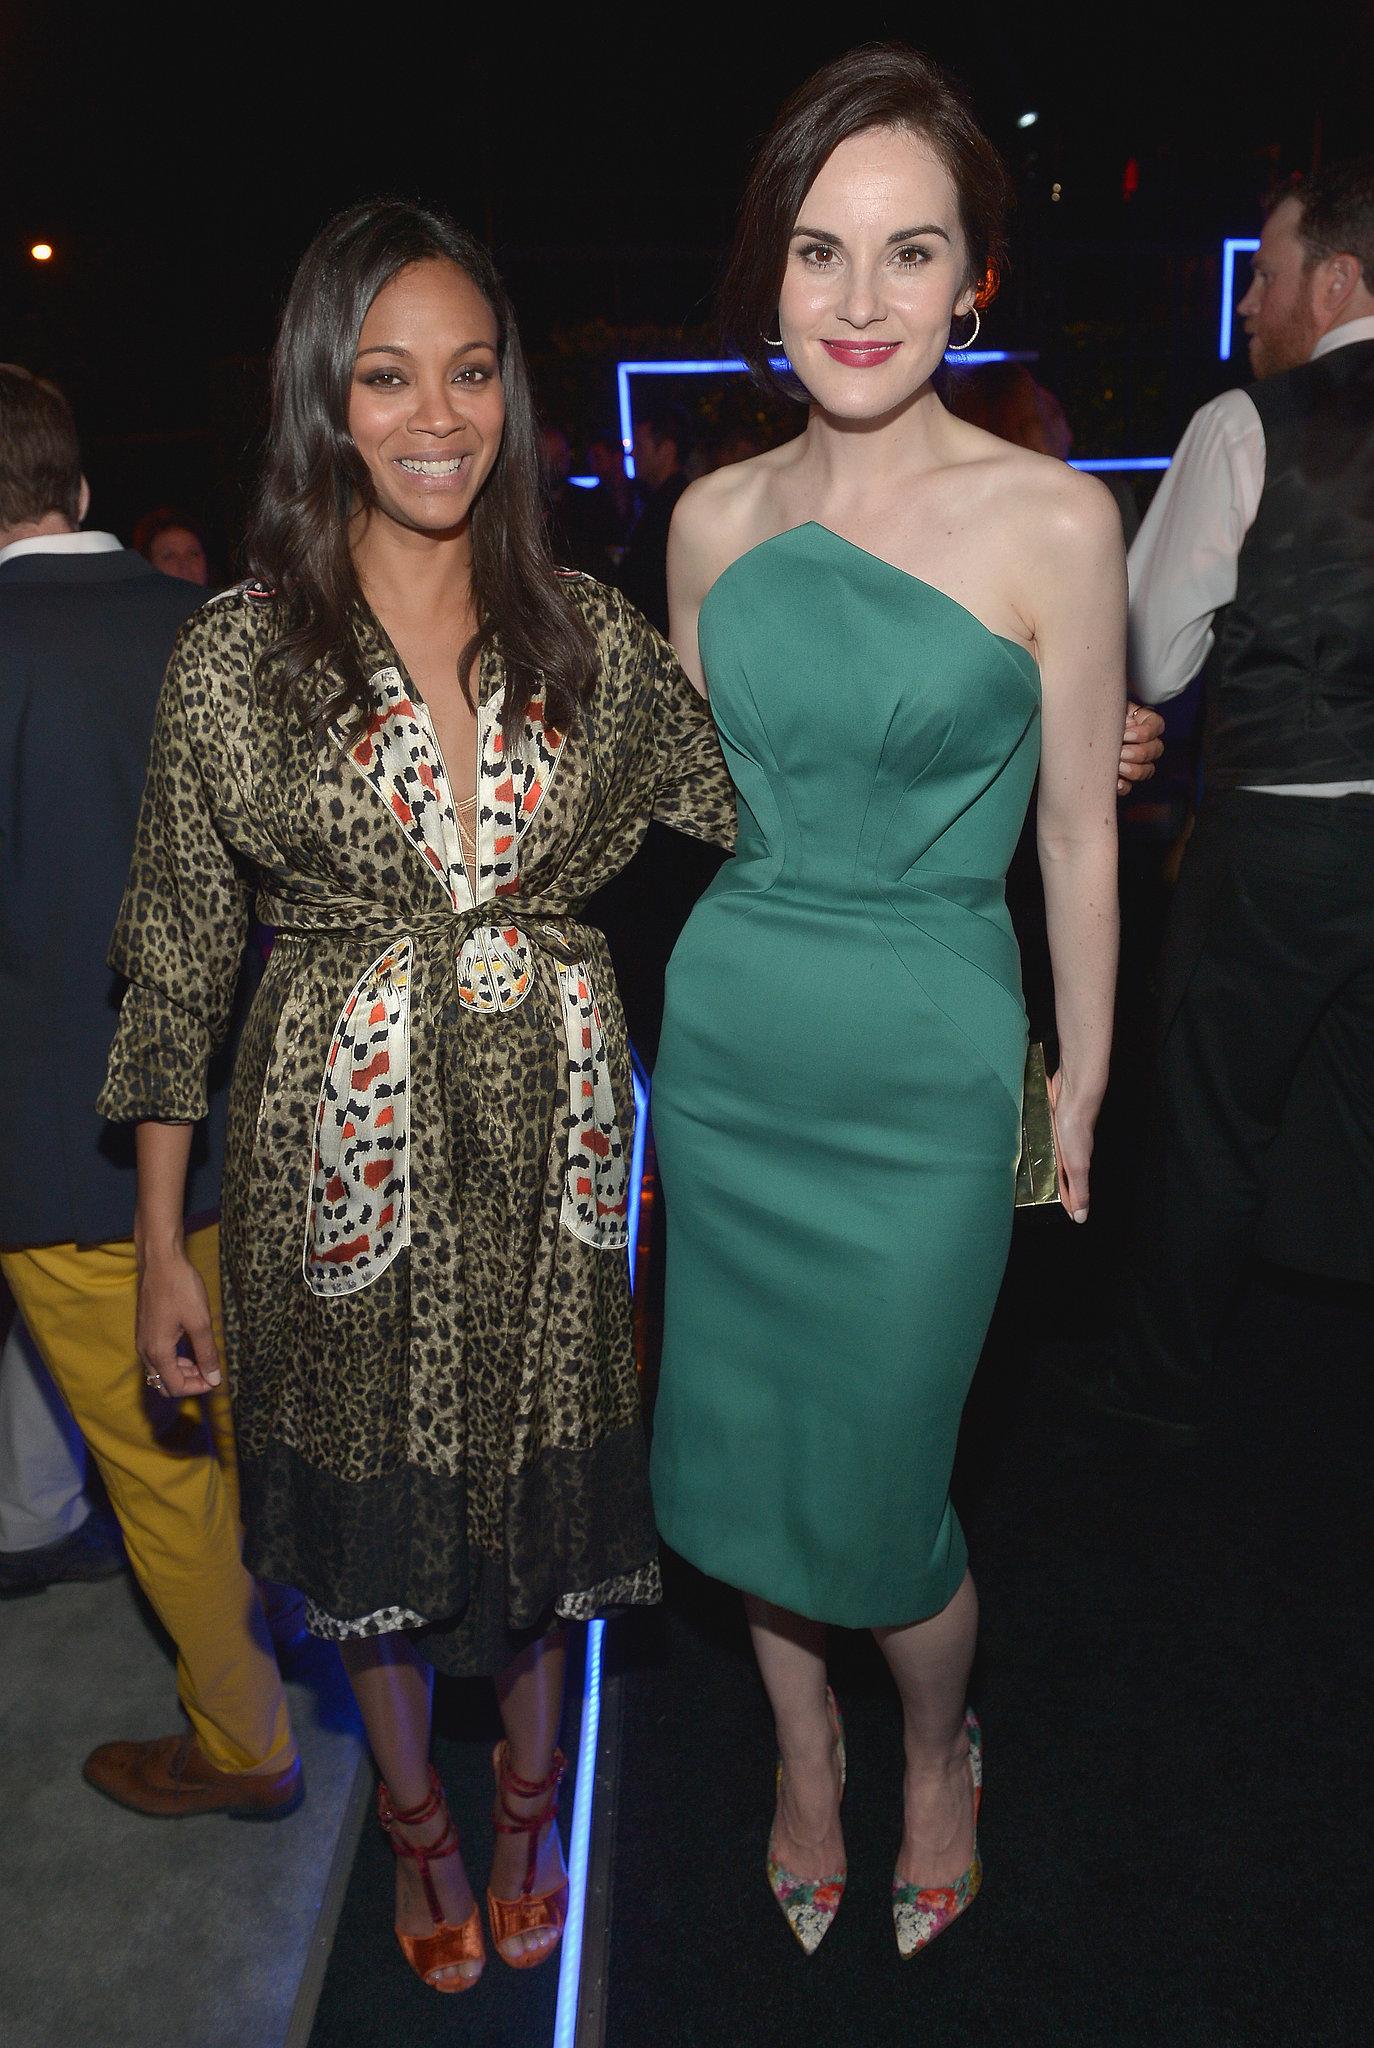 Michelle Dockery mingled with Zoe Saldana.